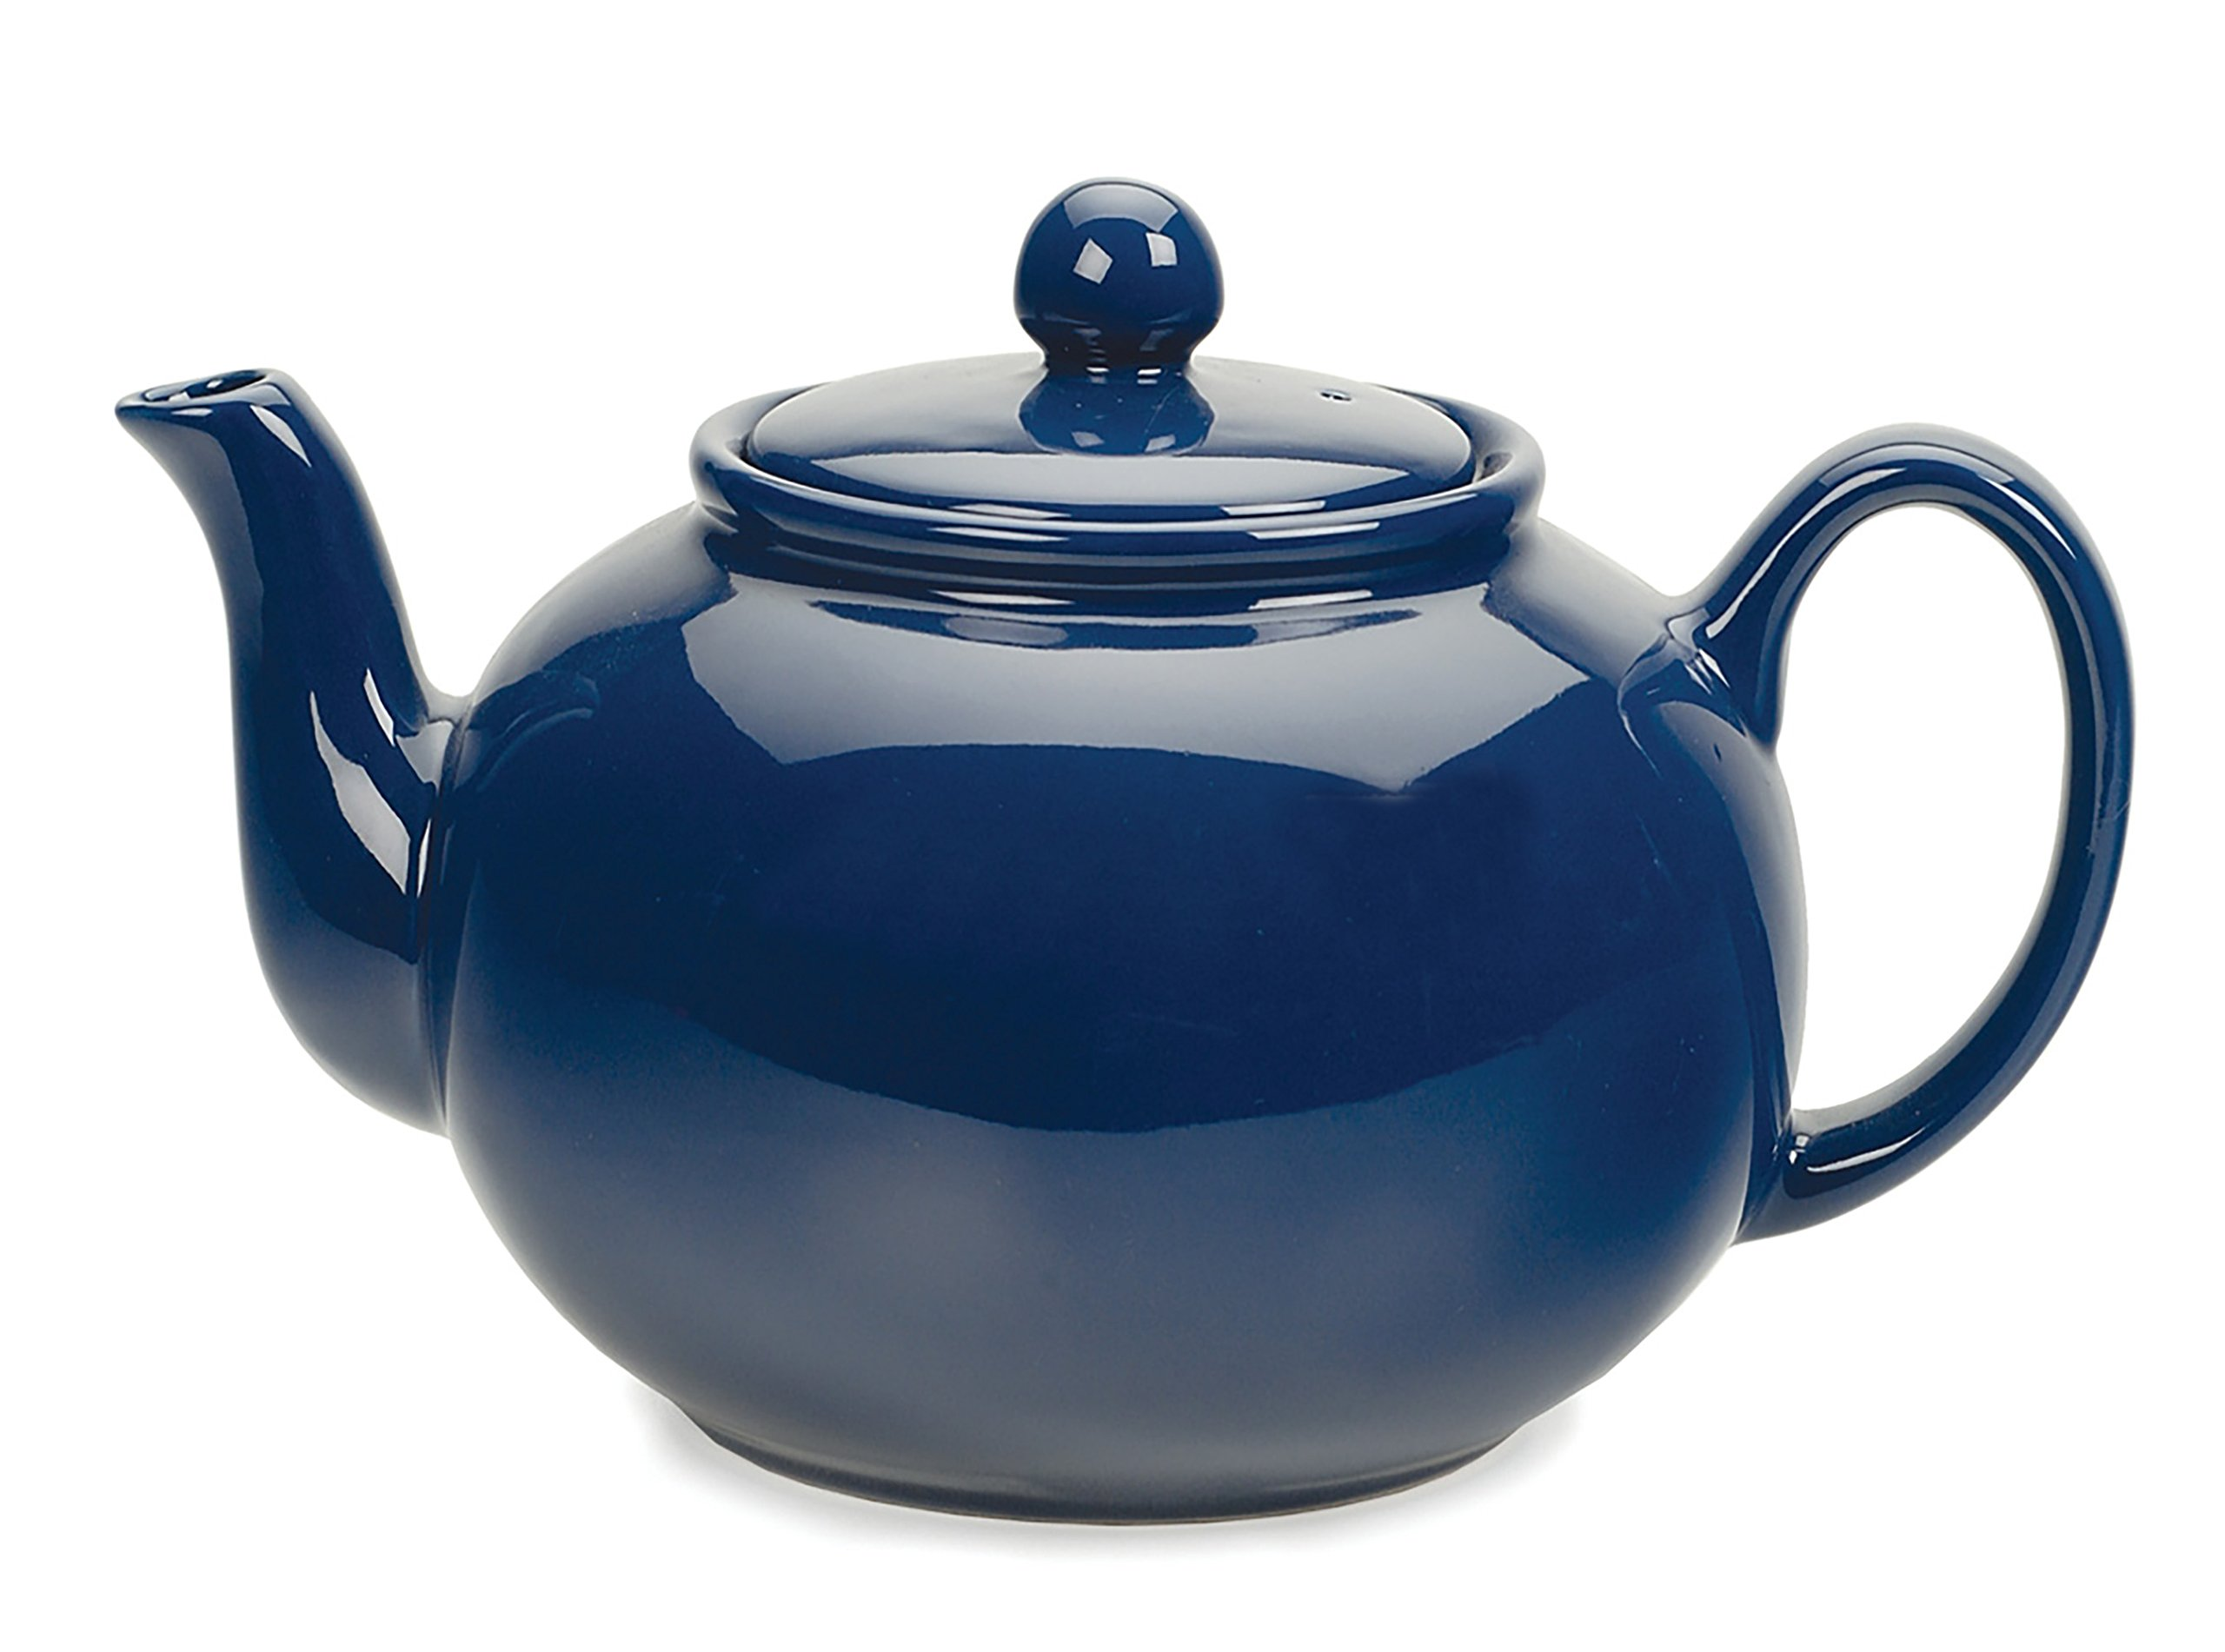 RSVP Stoneware Teapot, 48 oz, Blue by RSVP International